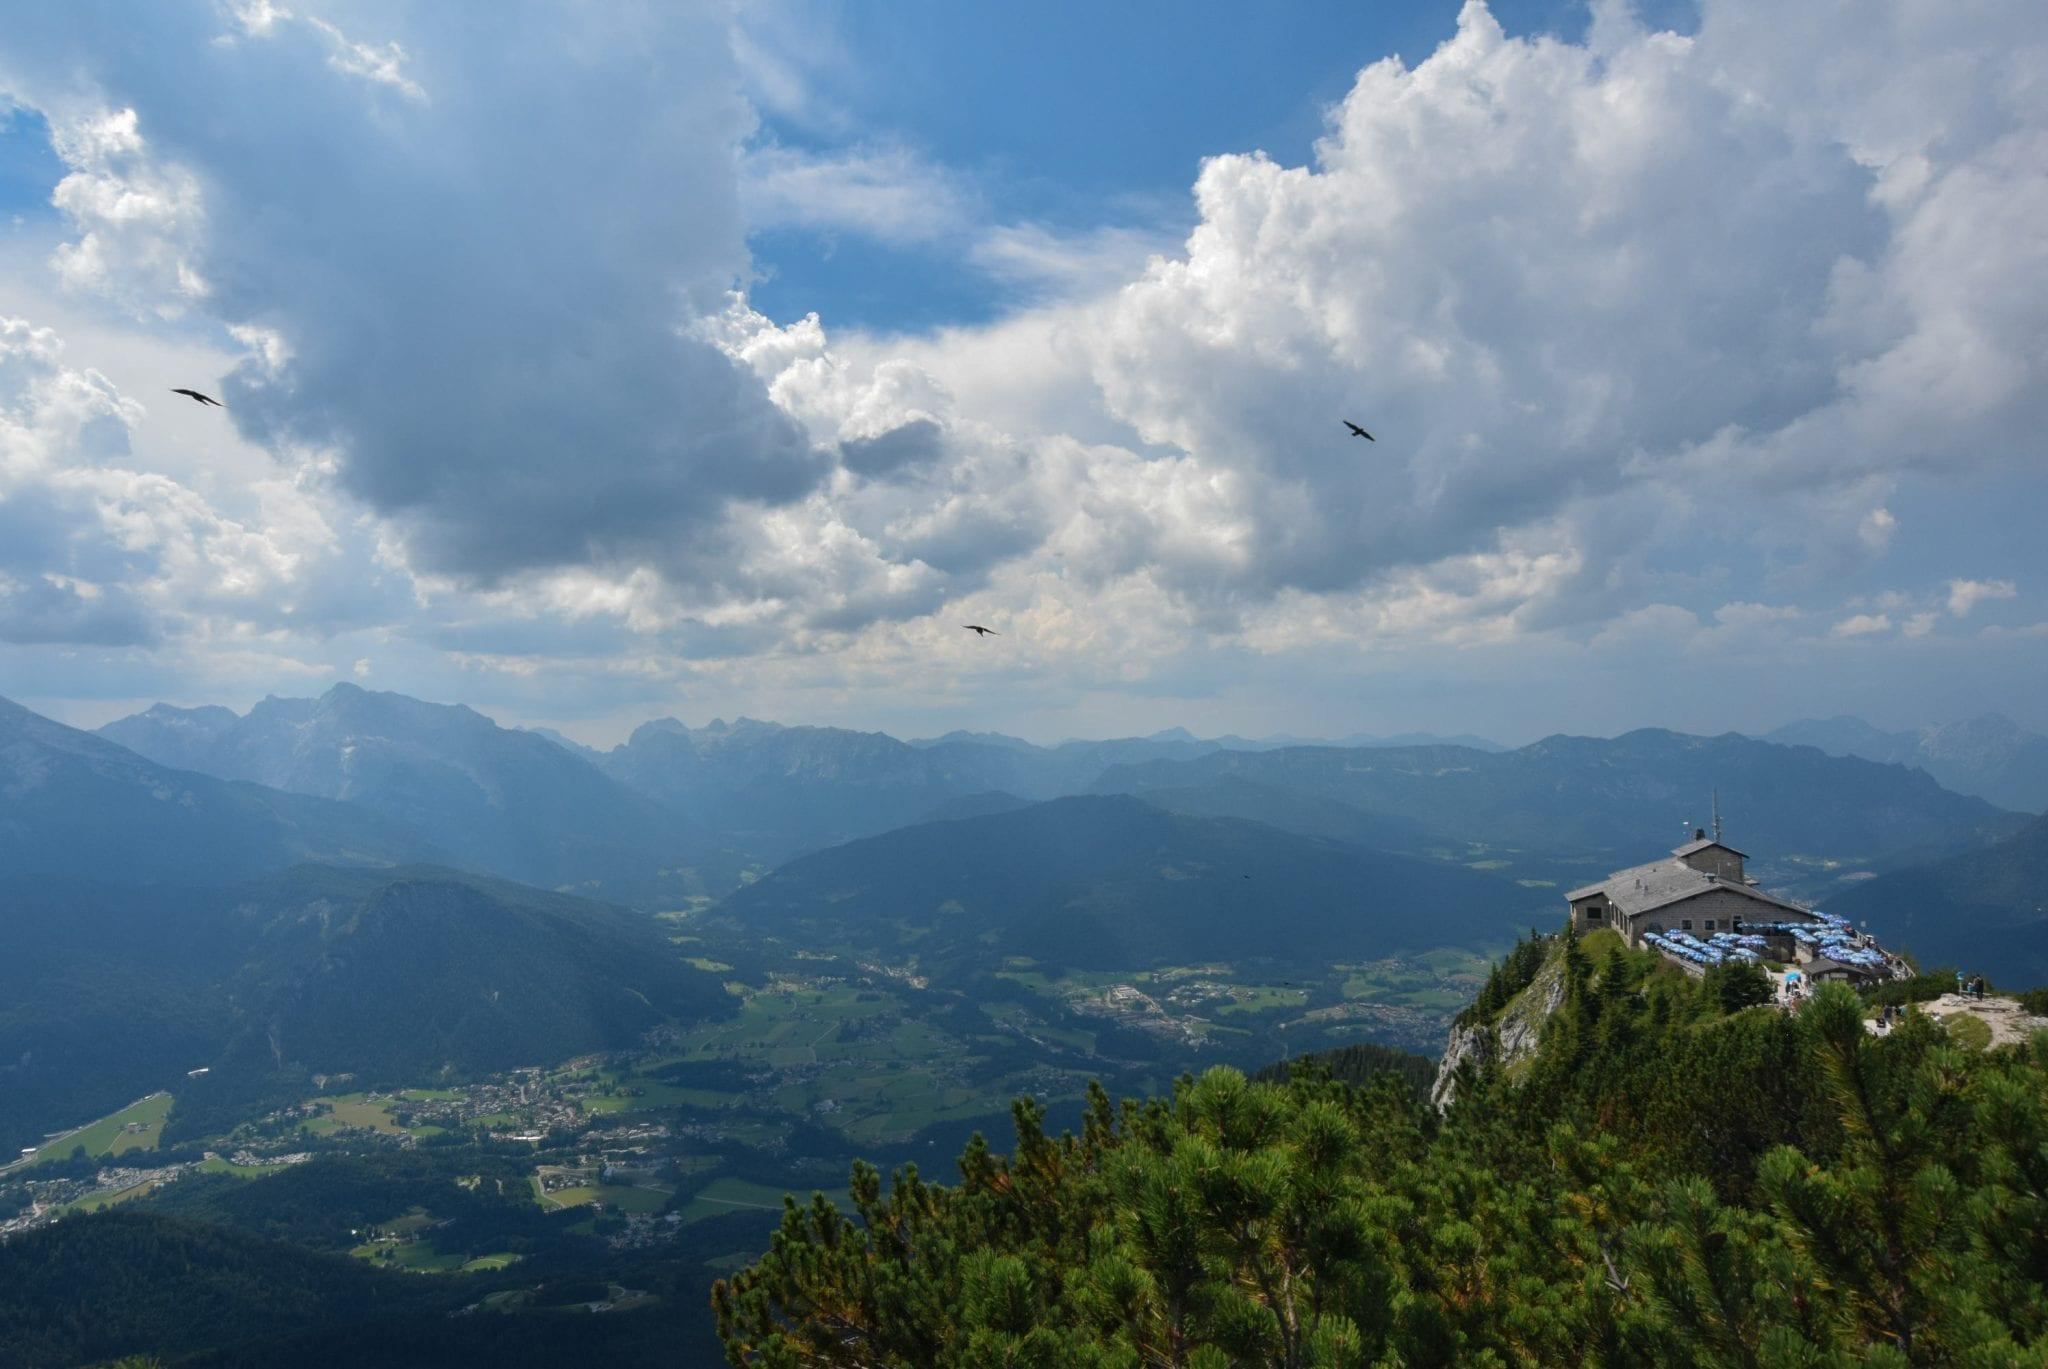 alps mountains eagle's nest austria germany berchtesgaden hitler summer alpine resort